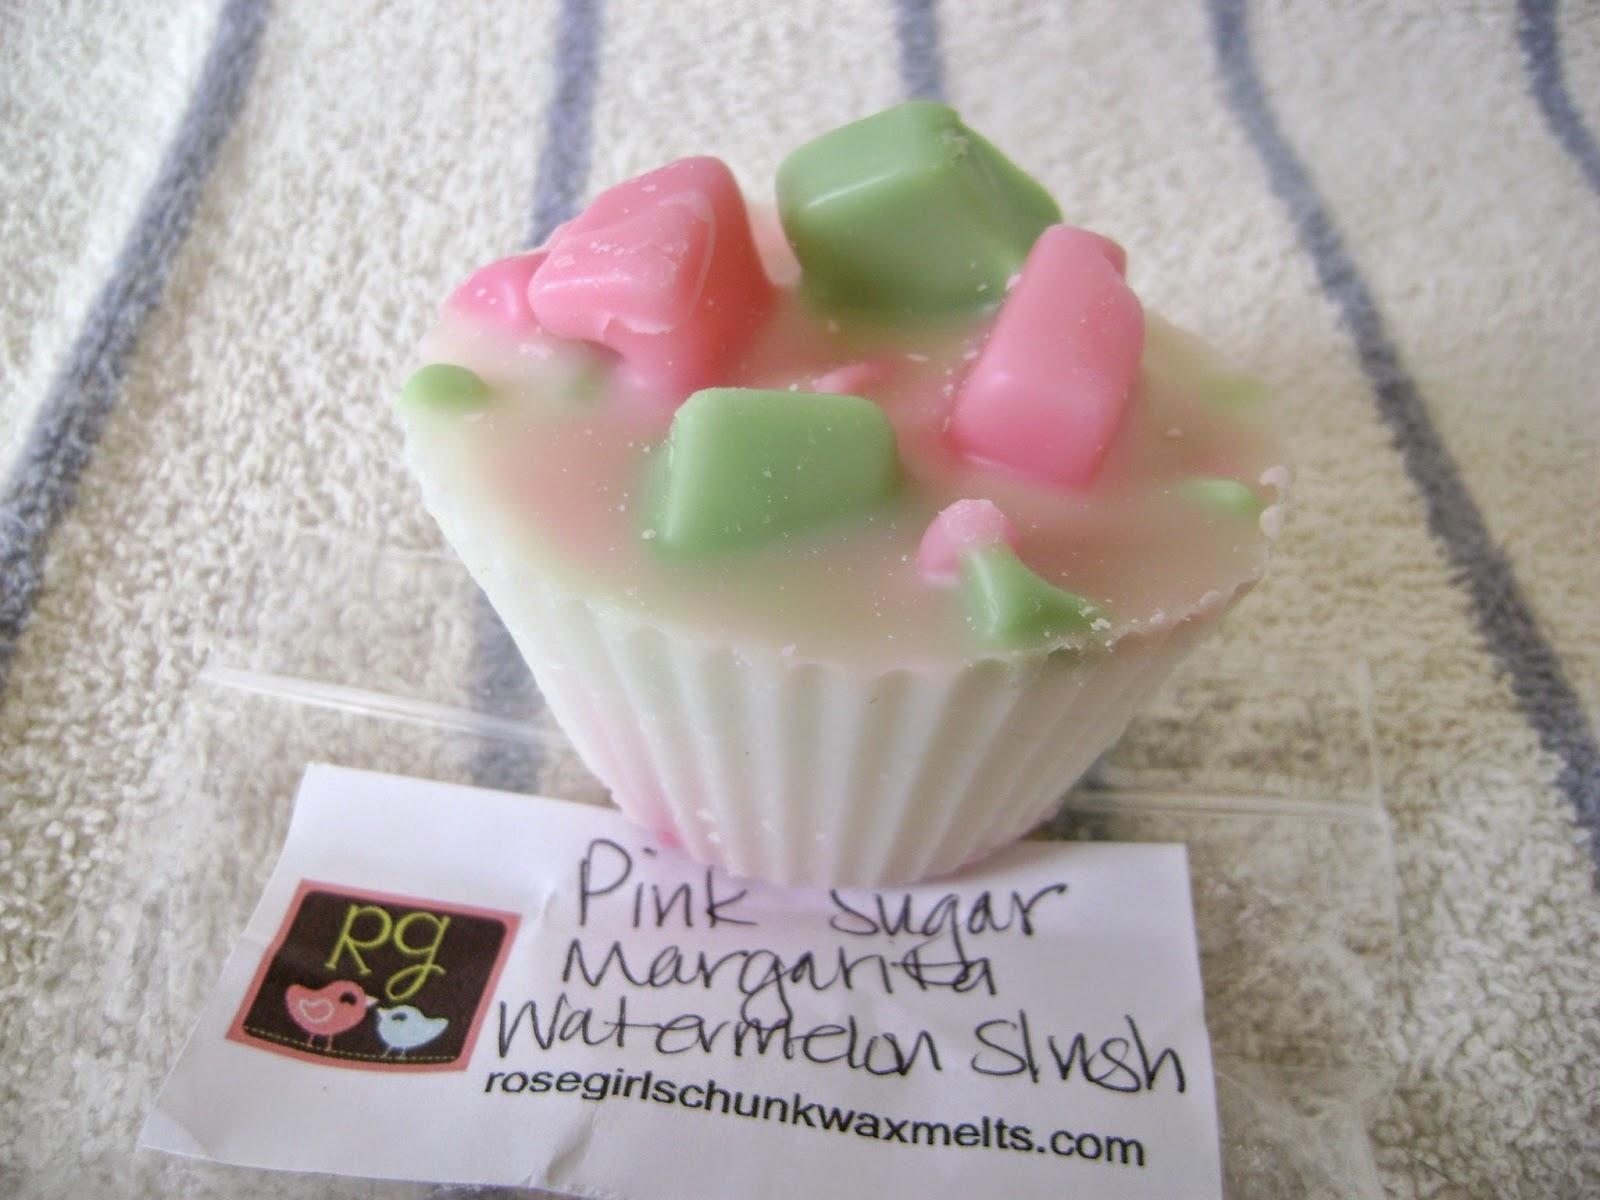 Pink Sugar / Margarita / Watermelon Slush